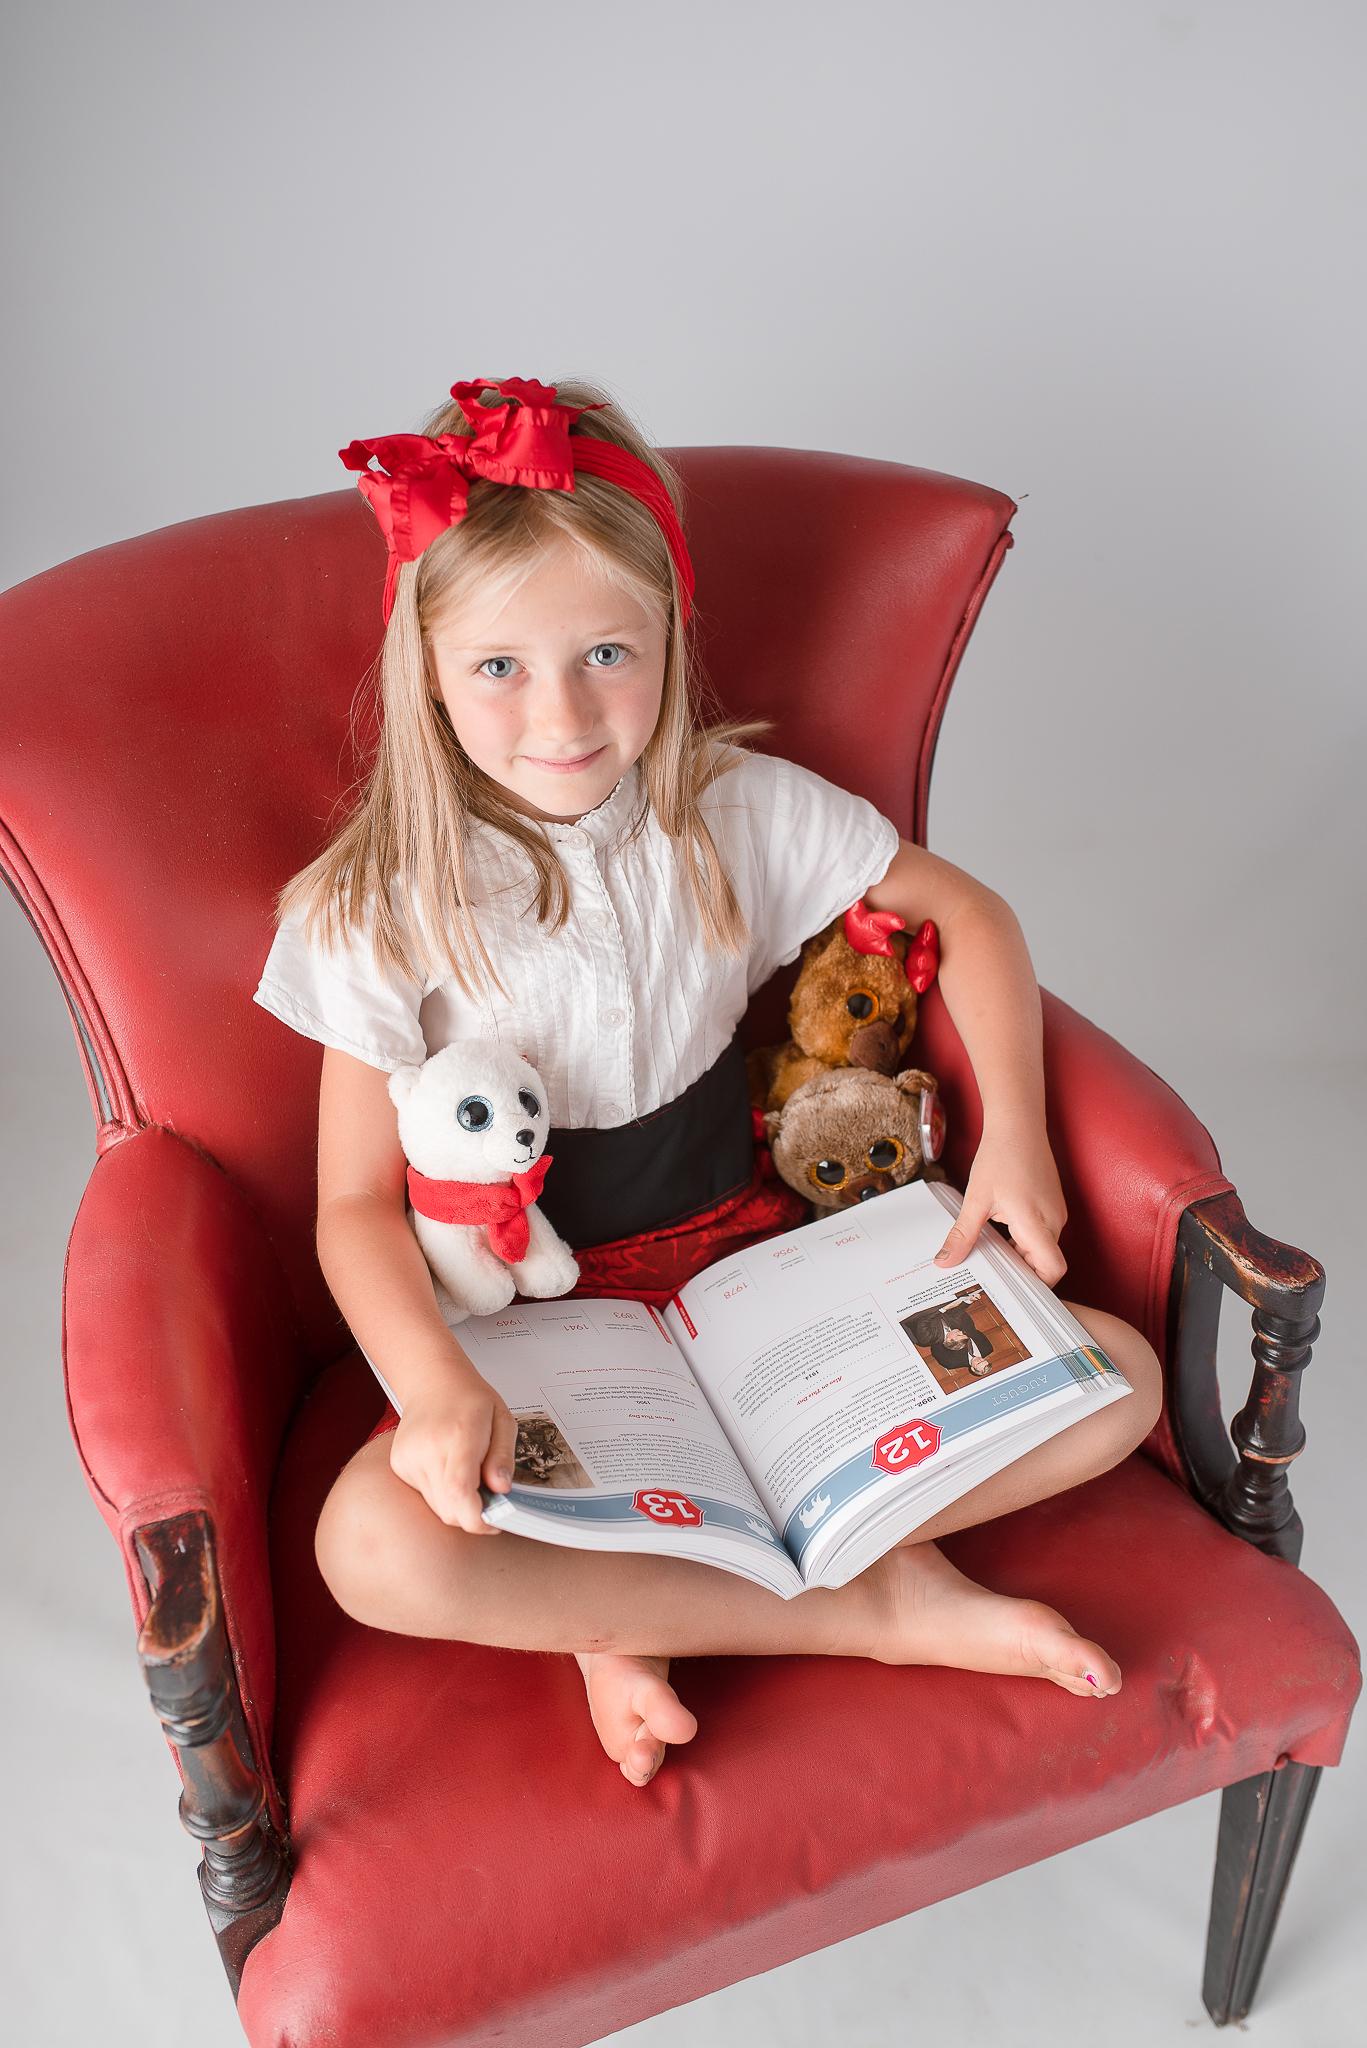 Naomi Lucienne Peterborough Photography Portrait Photography Children Photography Family Photography-3.jpg